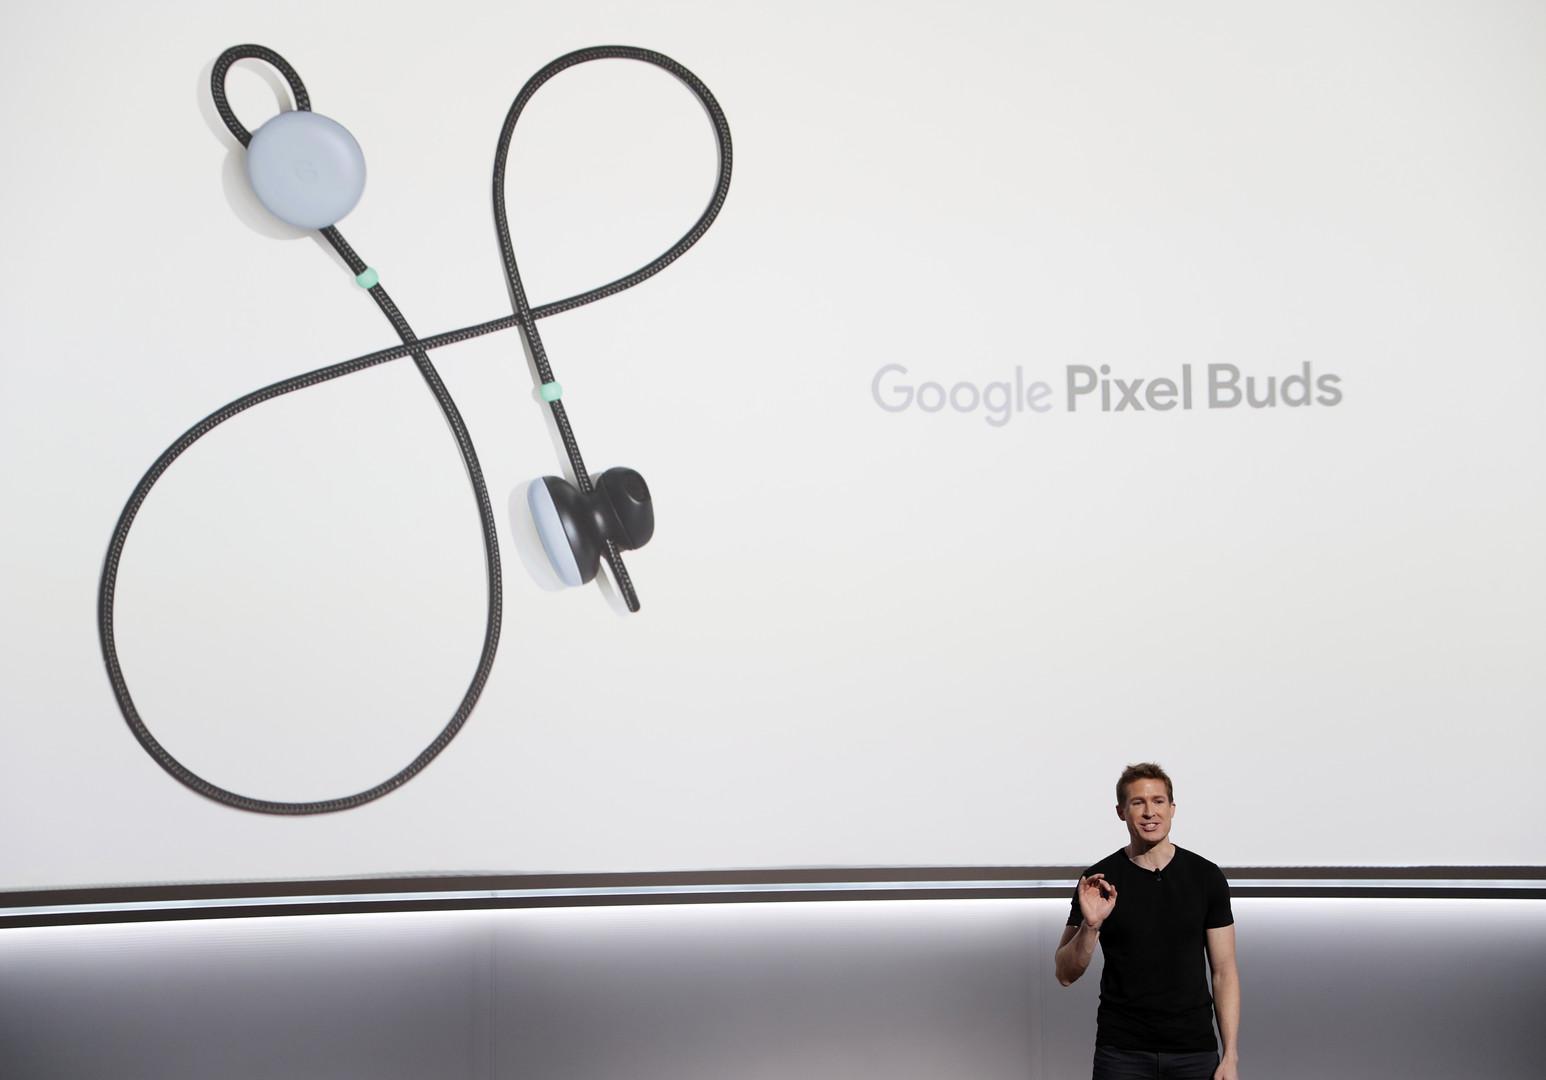 مفاجآت غوغل في مؤتمرها السنوي